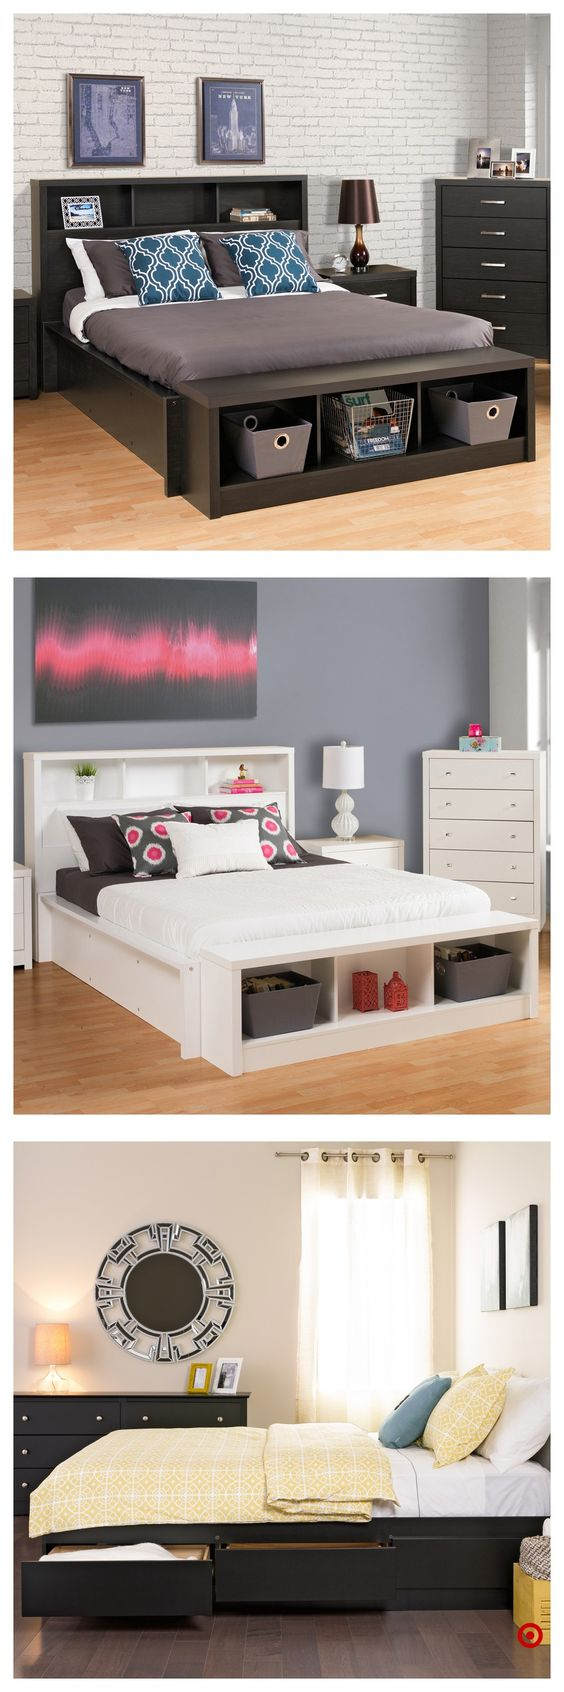 Diy Pallet Bed 8 - Amazing DIY Pallet Bed Ideas